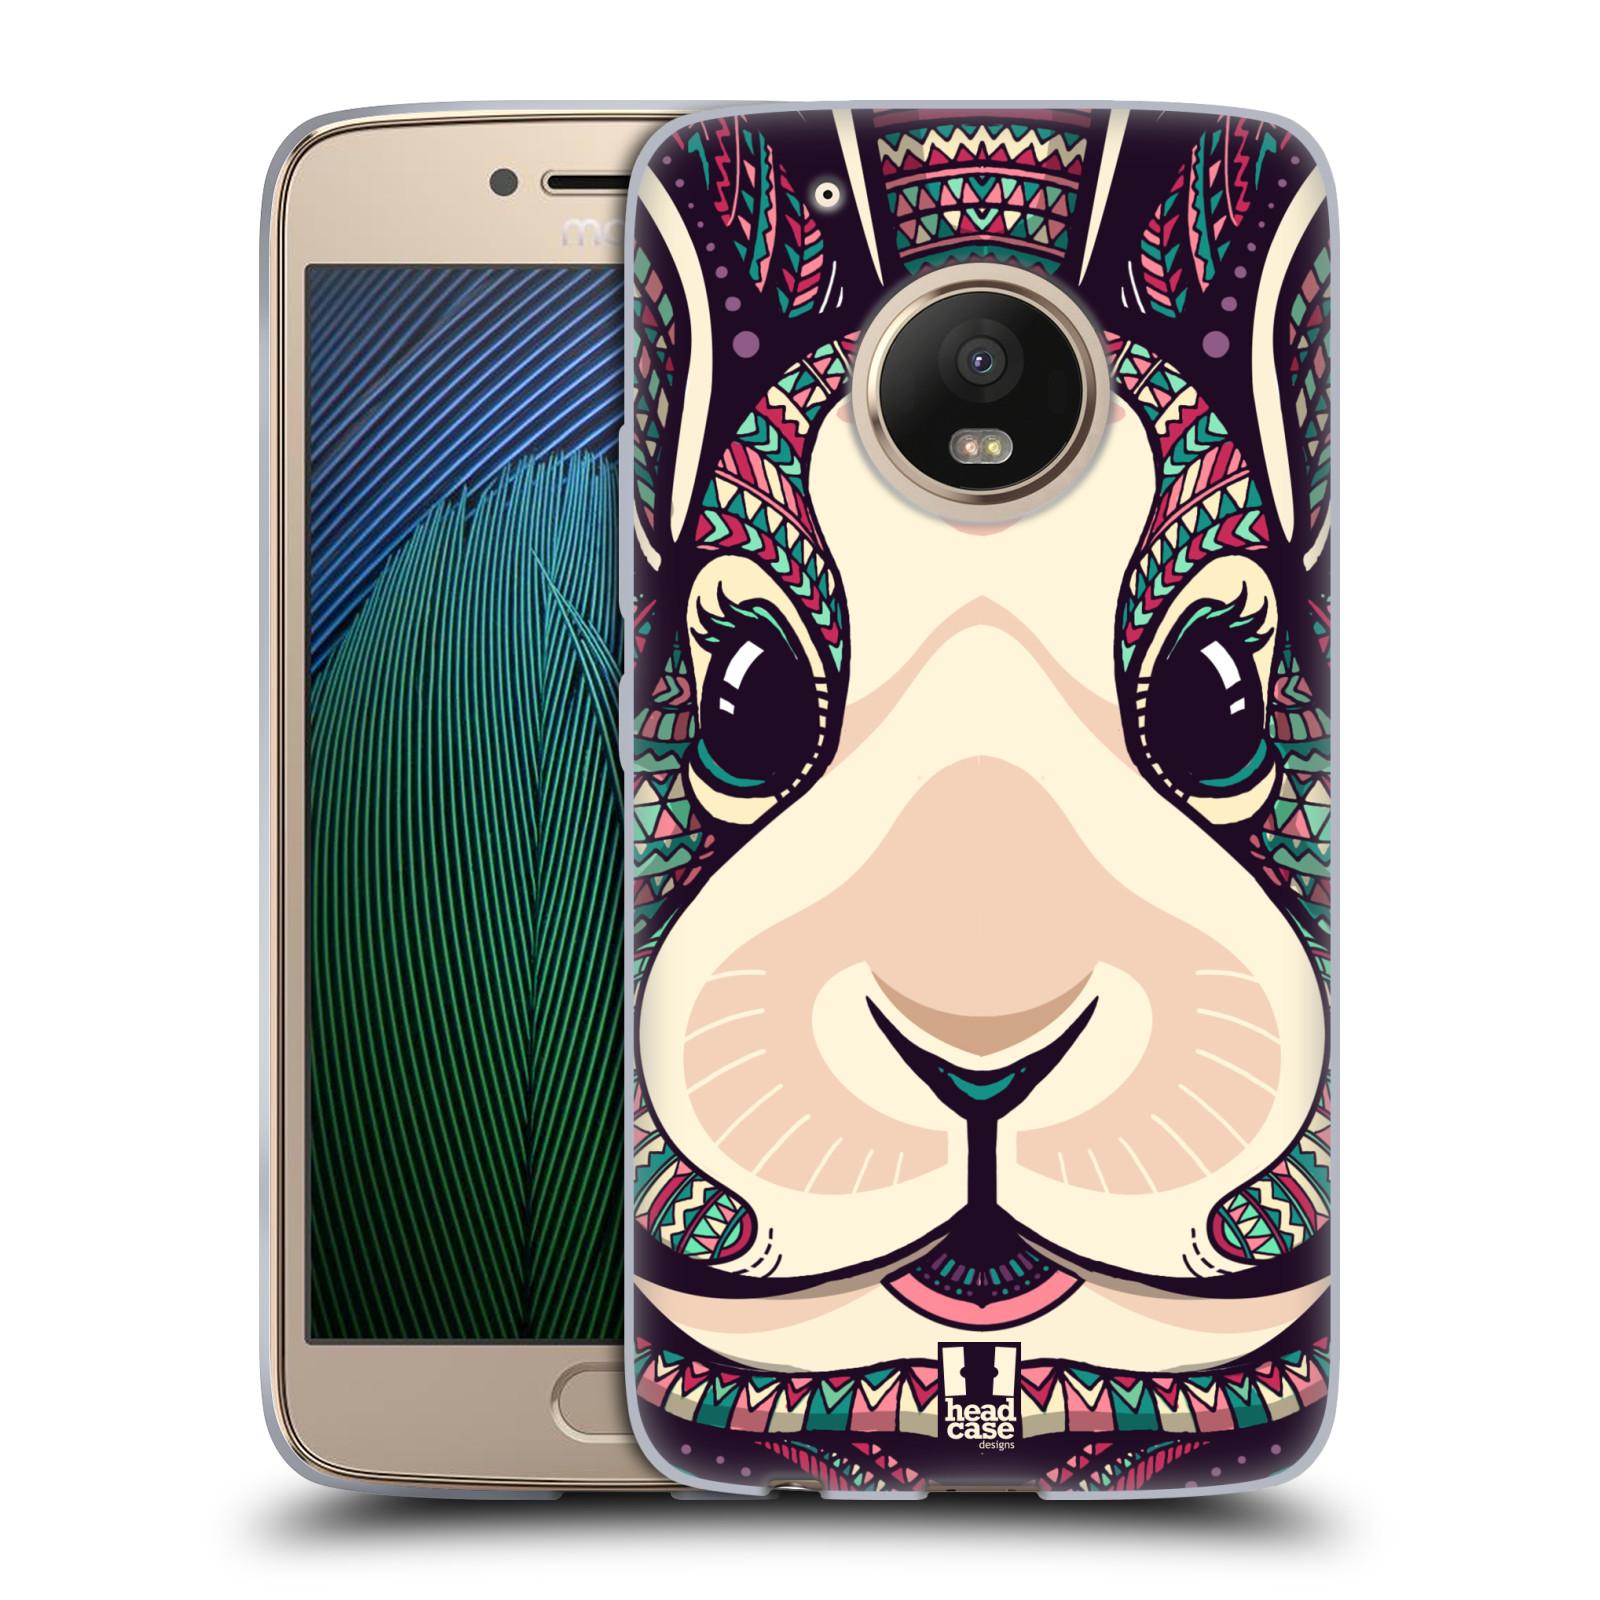 Silikonové pouzdro na mobil Lenovo Moto G5 Plus - Head Case AZTEC ZAJÍČEK